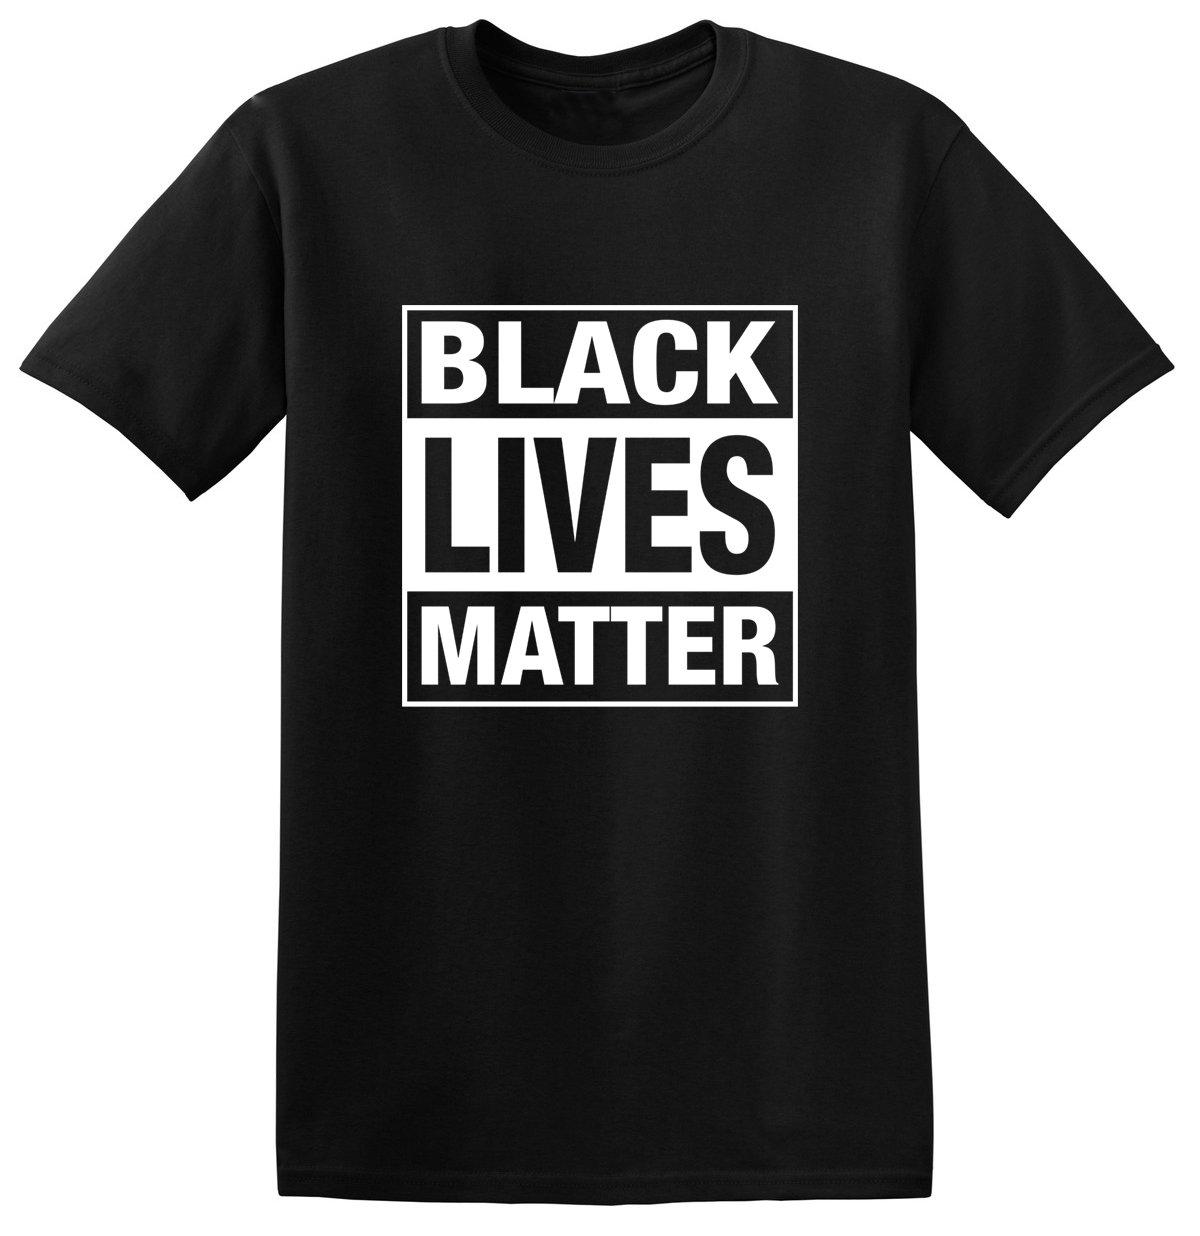 New York Fashion Police Black Lives Matter Political Protest Shirts